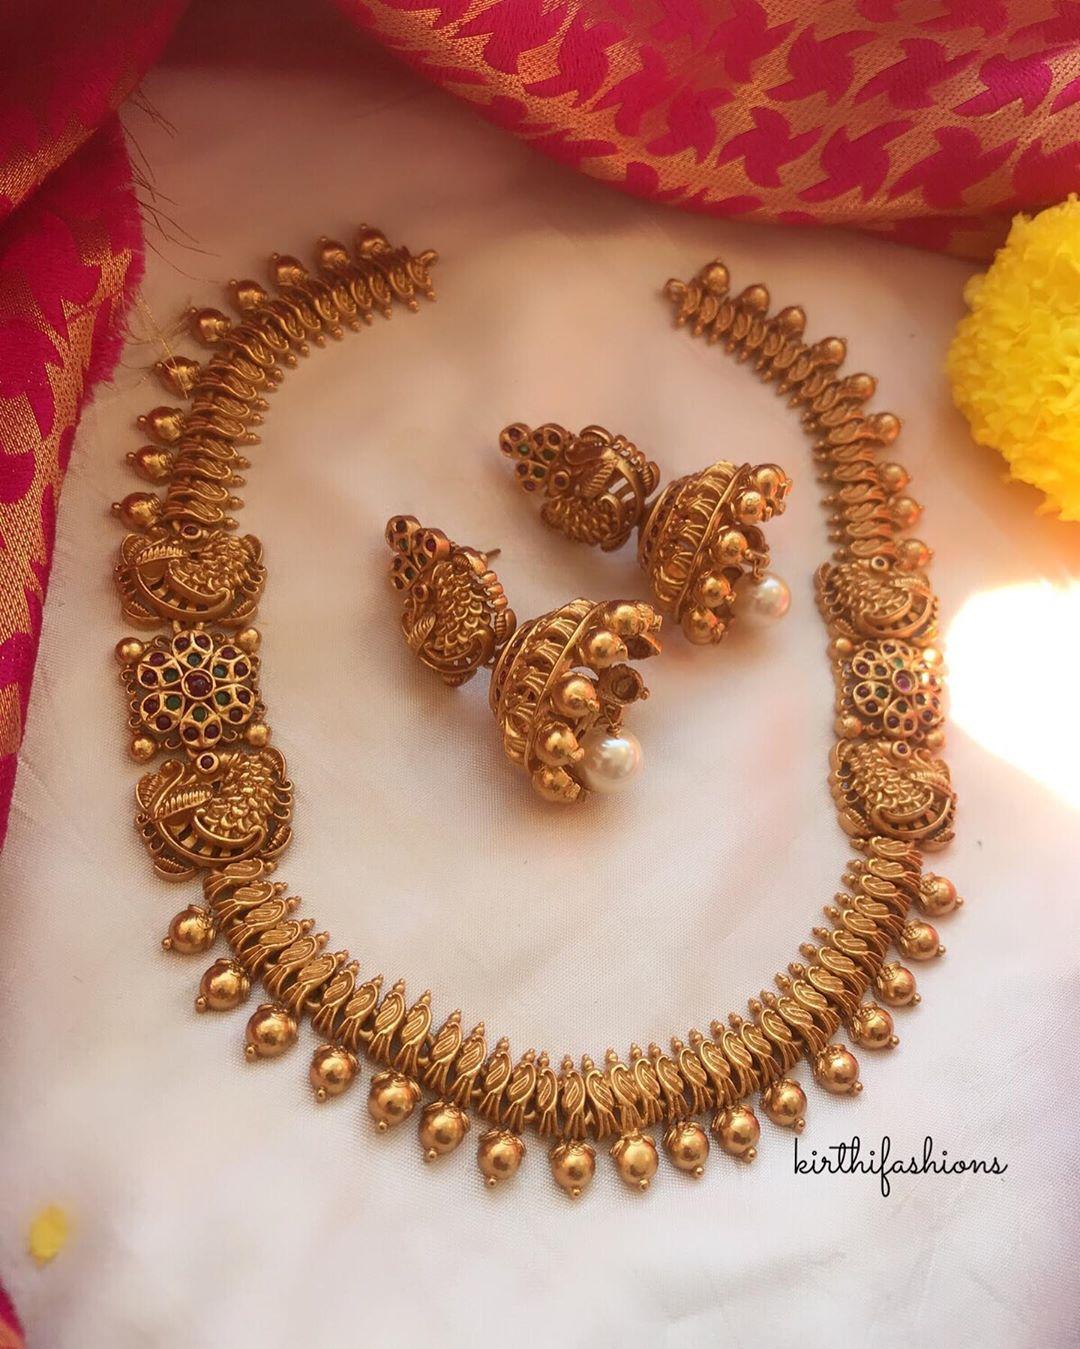 imitation-jewellery-online-shopping-16